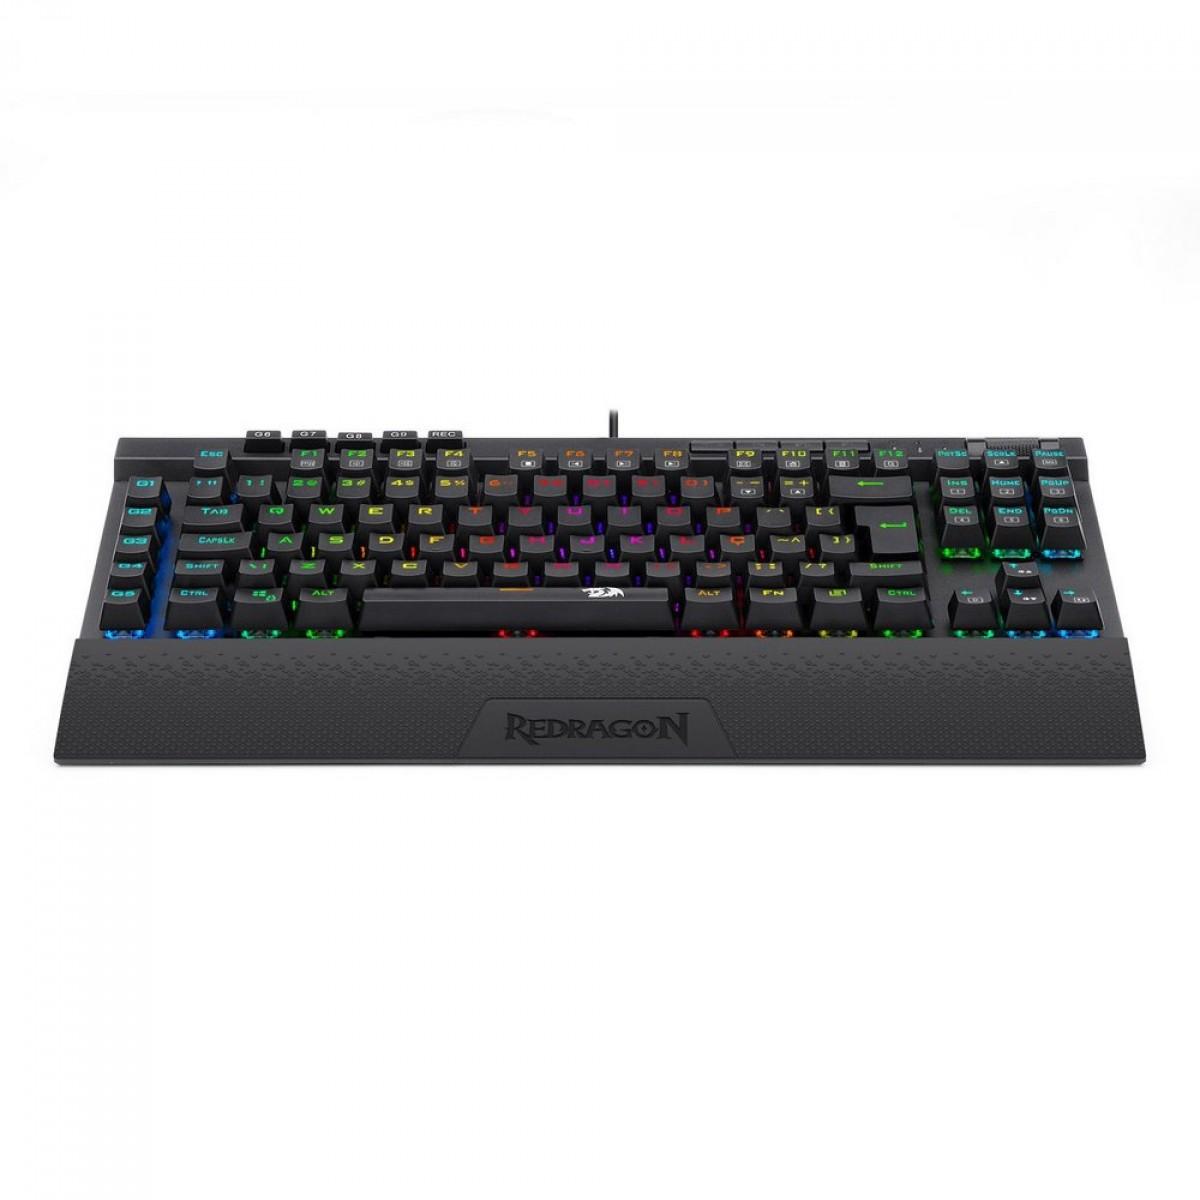 Teclado Mecânico Gamer Redragon K587 Magic Wand Pro, RGB, Switch Brown, Black, ABNT, K587RGB-PRO (PT-BROWN)